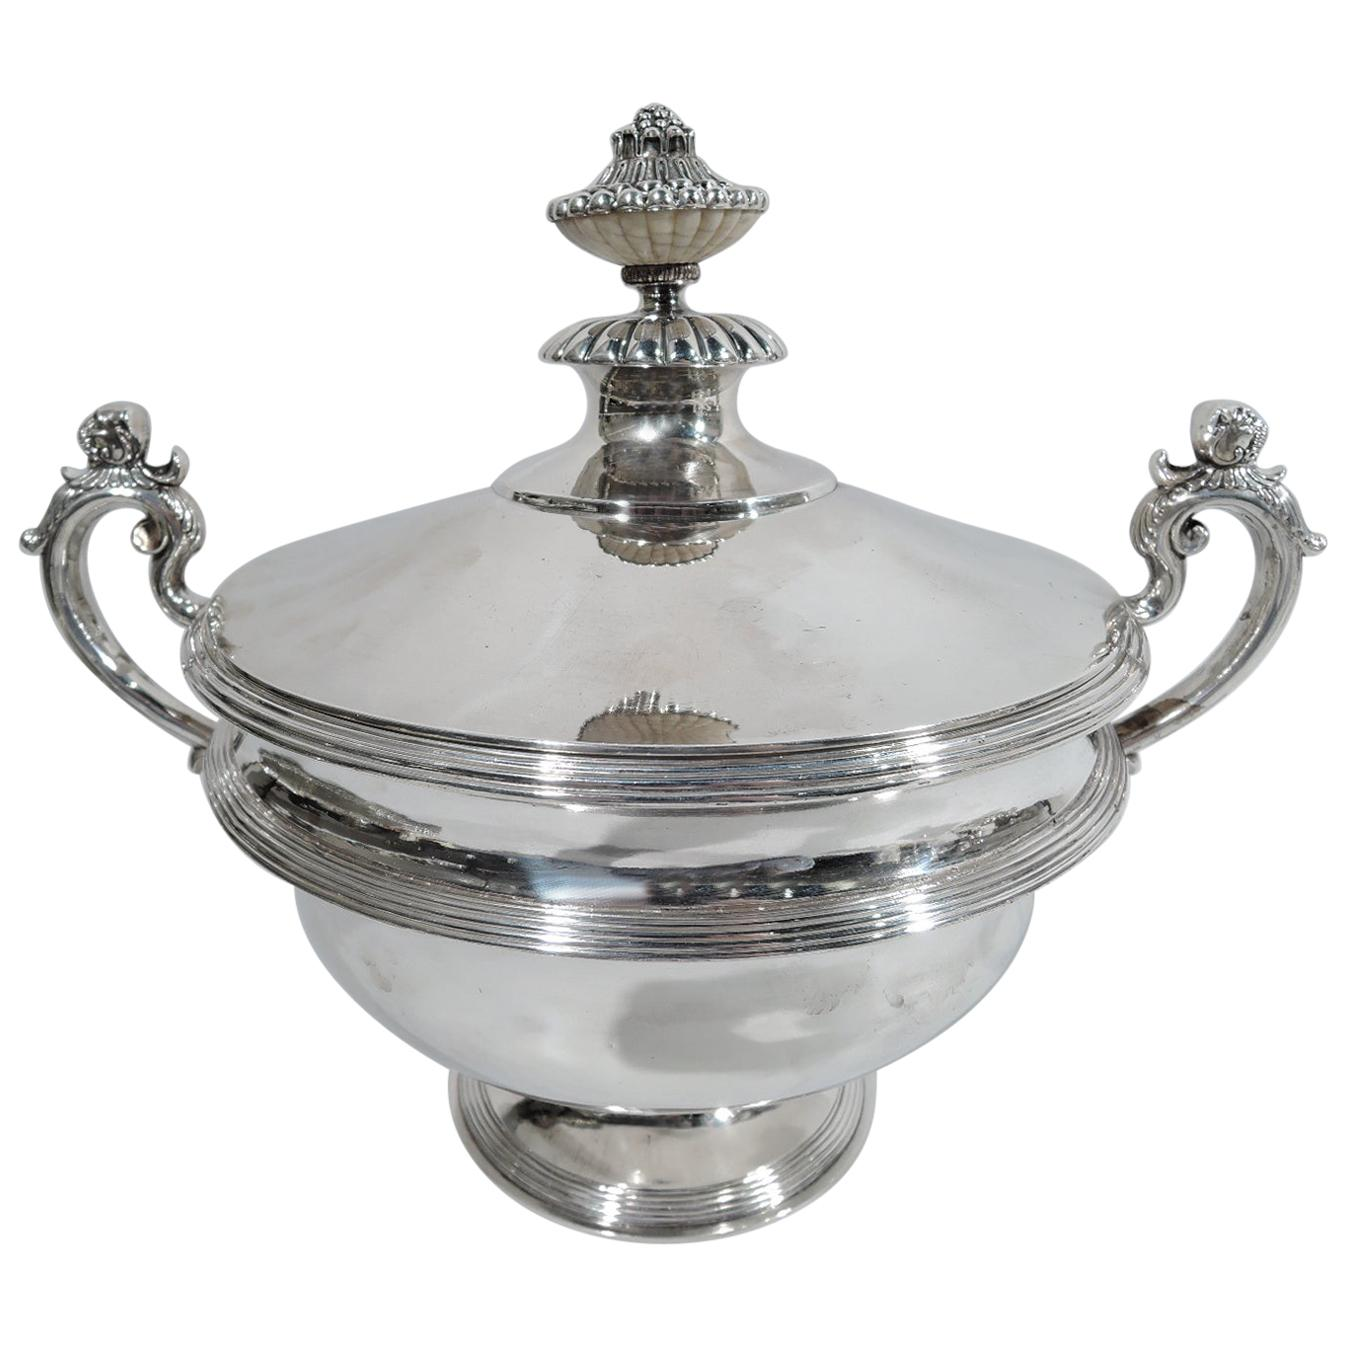 Antique European Classical Handmade Silver Soup Tureen